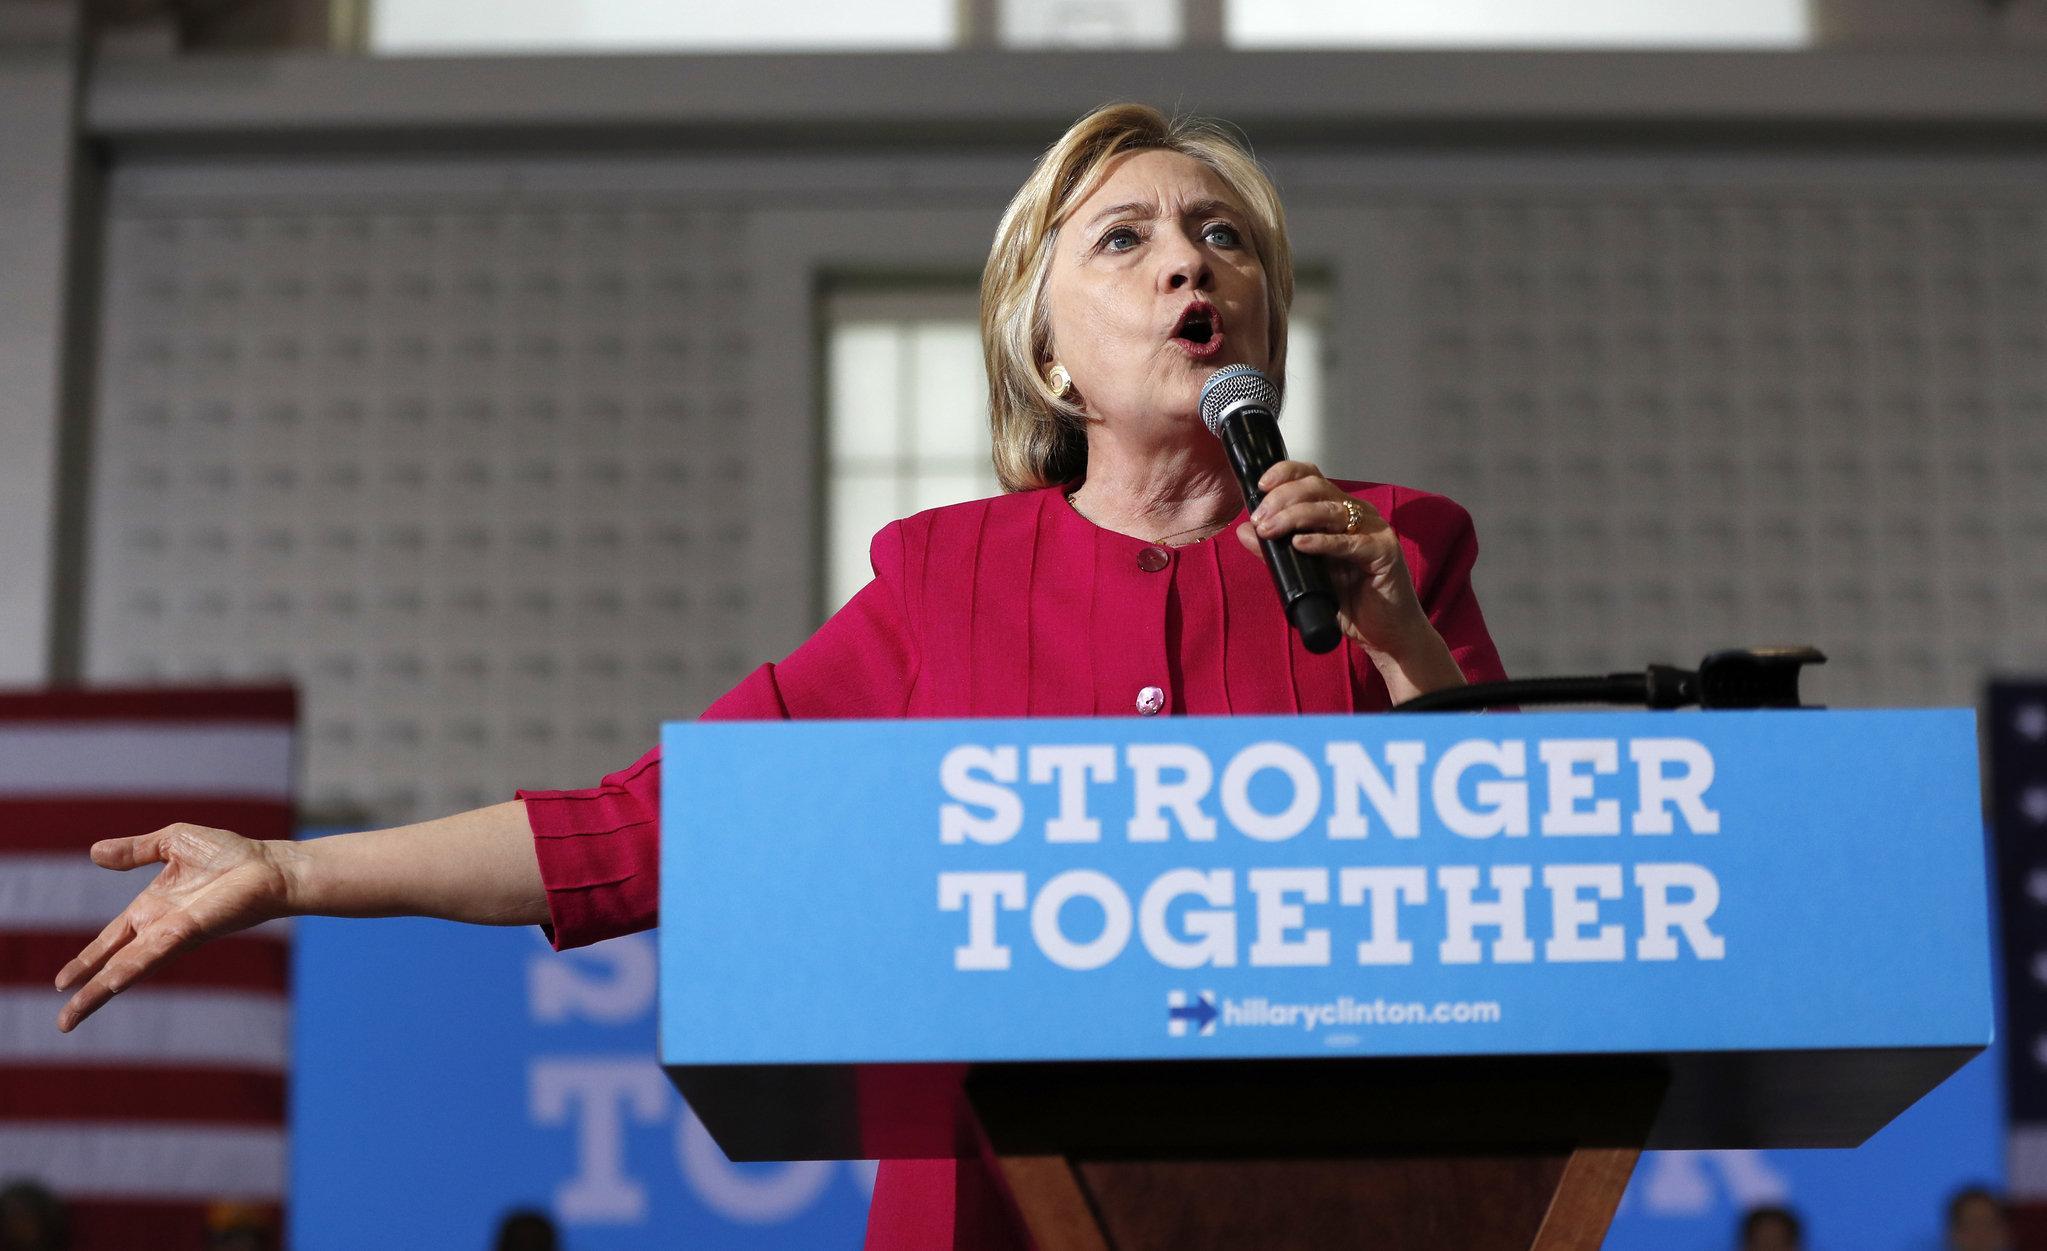 Democratic presidential hopeful Hillary Clinton. Courtesy of the Associated Press